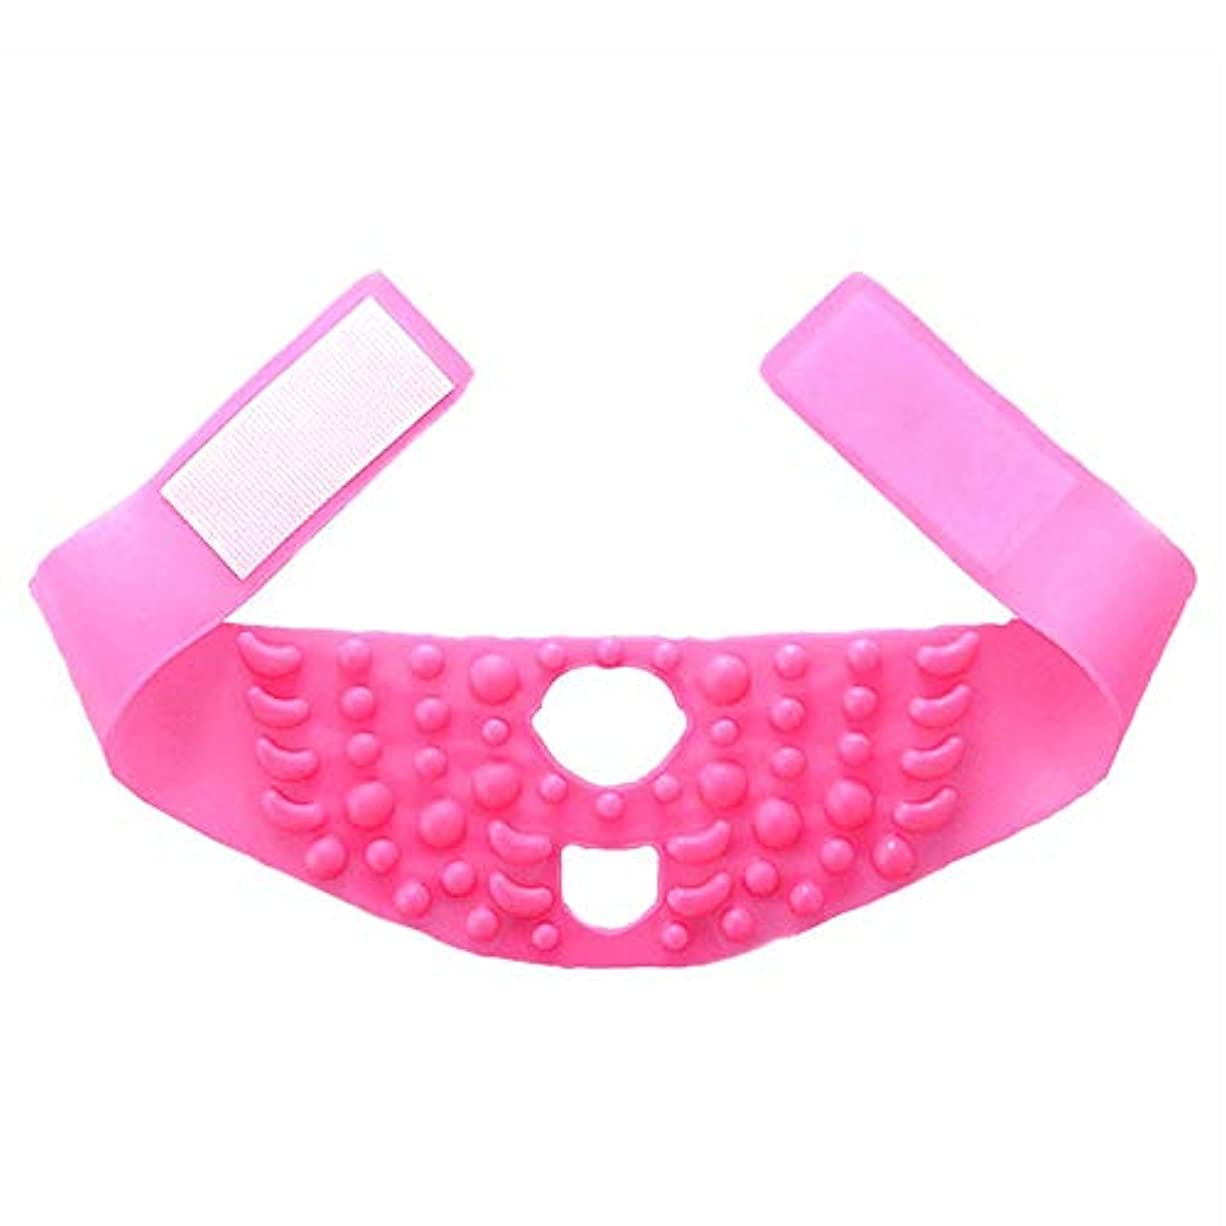 GYZ シンフェイスマスクシリコーンマッサージ引き締まった形の小さなVフェイスリフティングに薄いフェイスアーティファクト包帯を飾る - ピンク Thin Face Belt